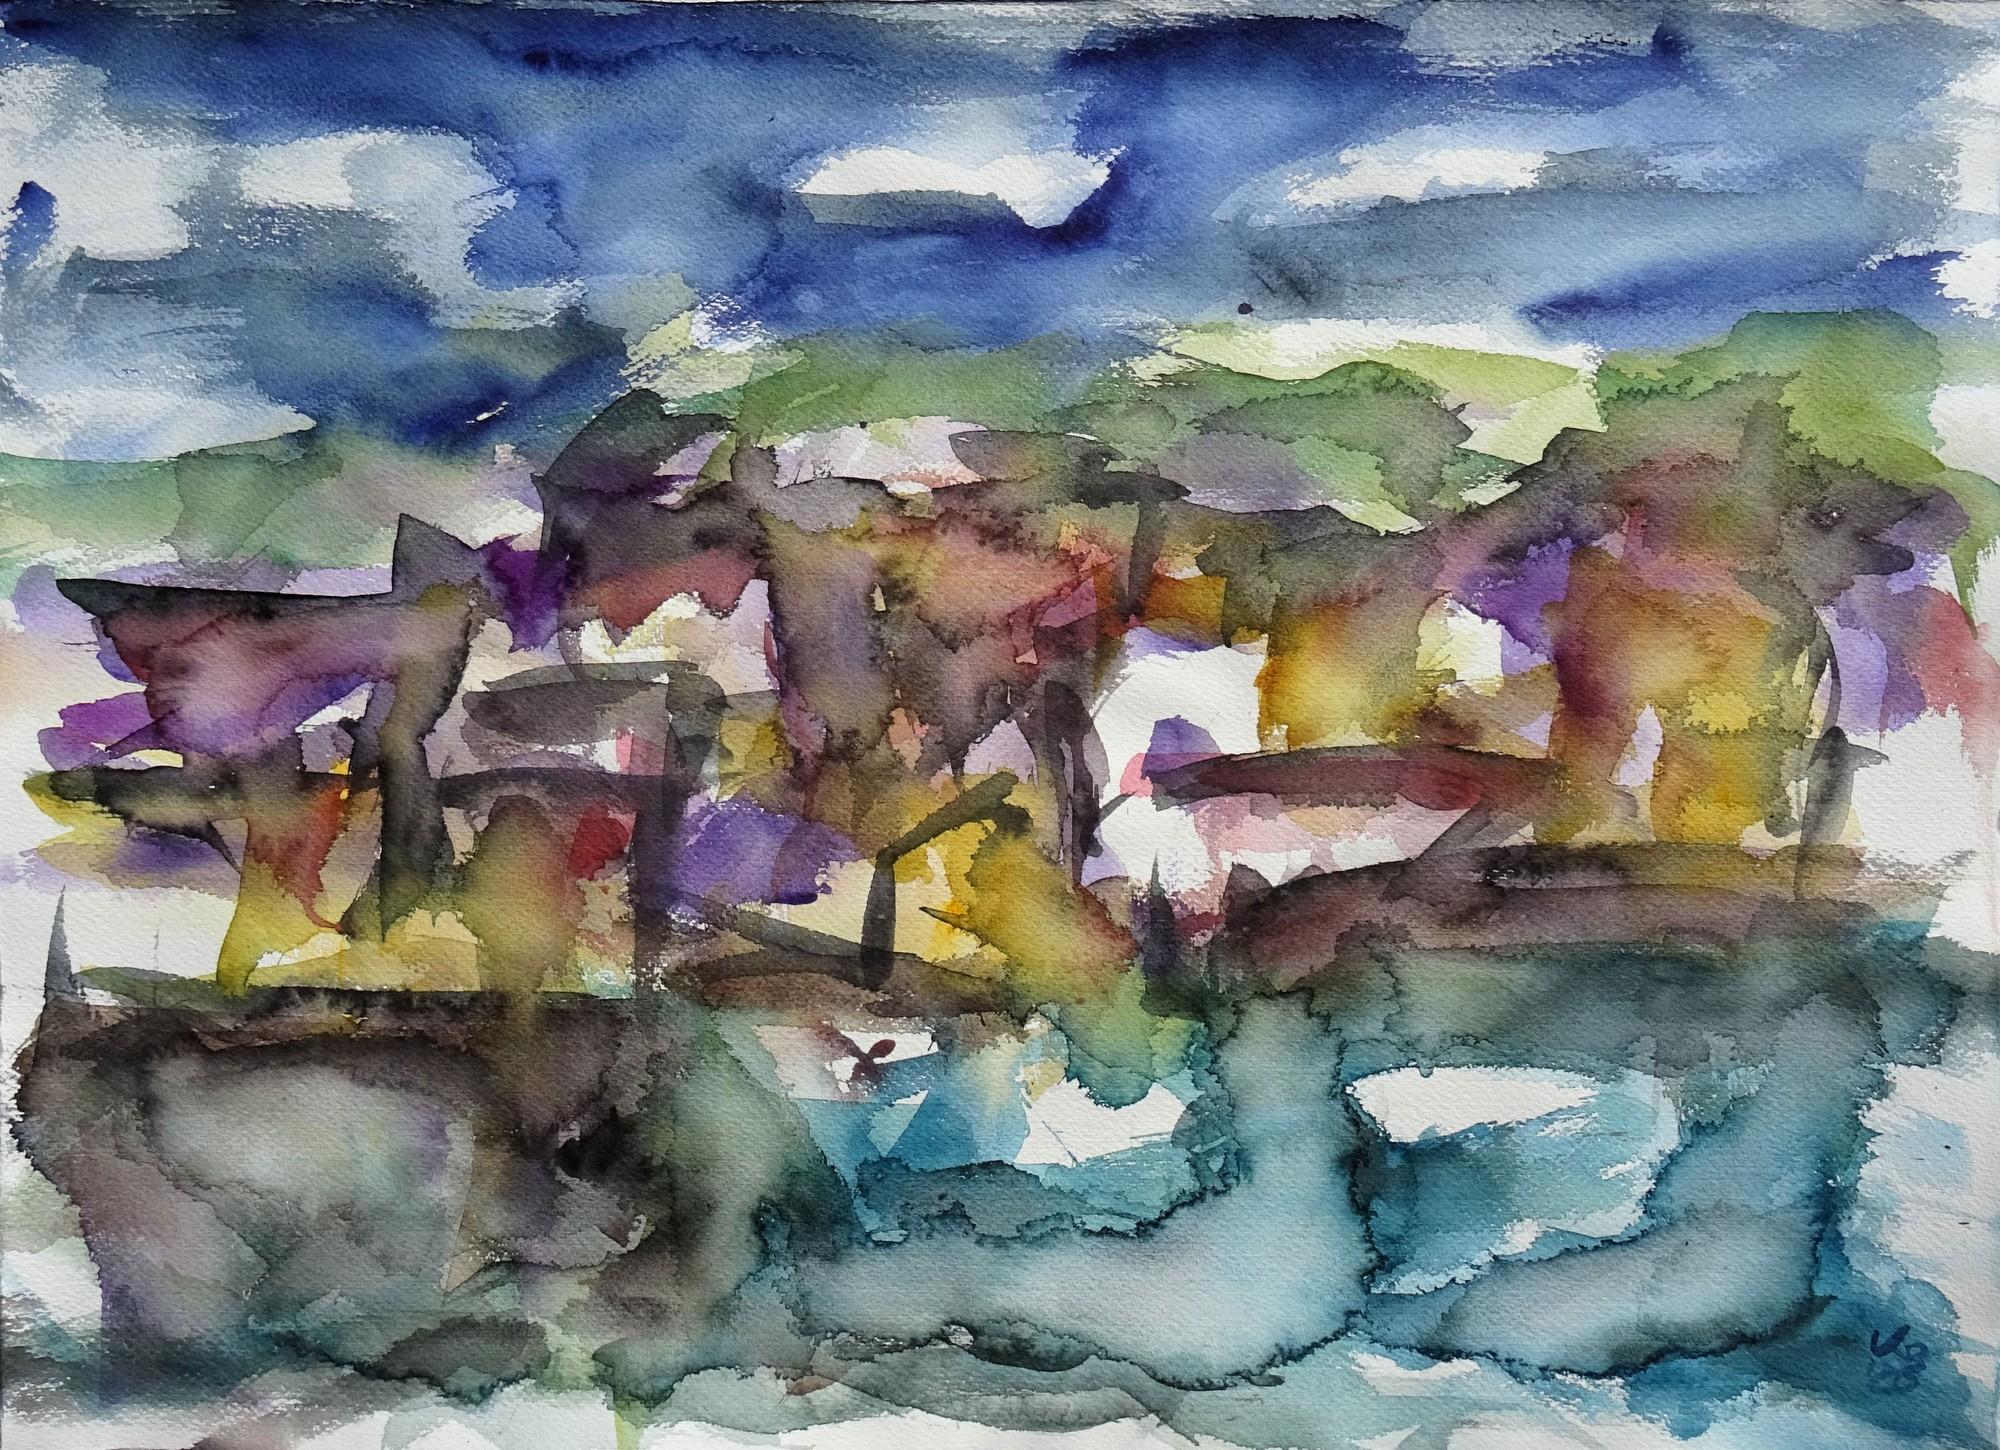 Orkney, Stromness, Watercolour 71 x 51,5 cm, © 2020 by Klaus Bölling